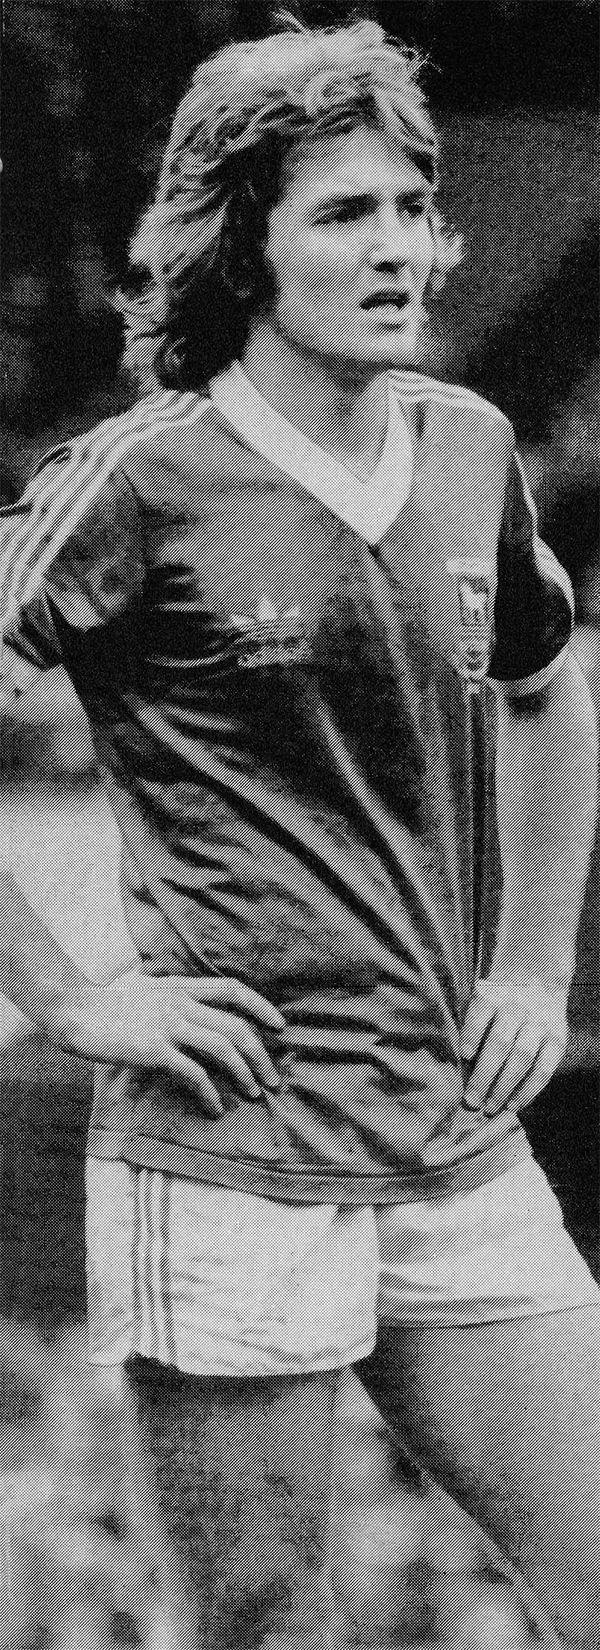 Circa 1980/81. Ipswich Town defender Russell Osman.